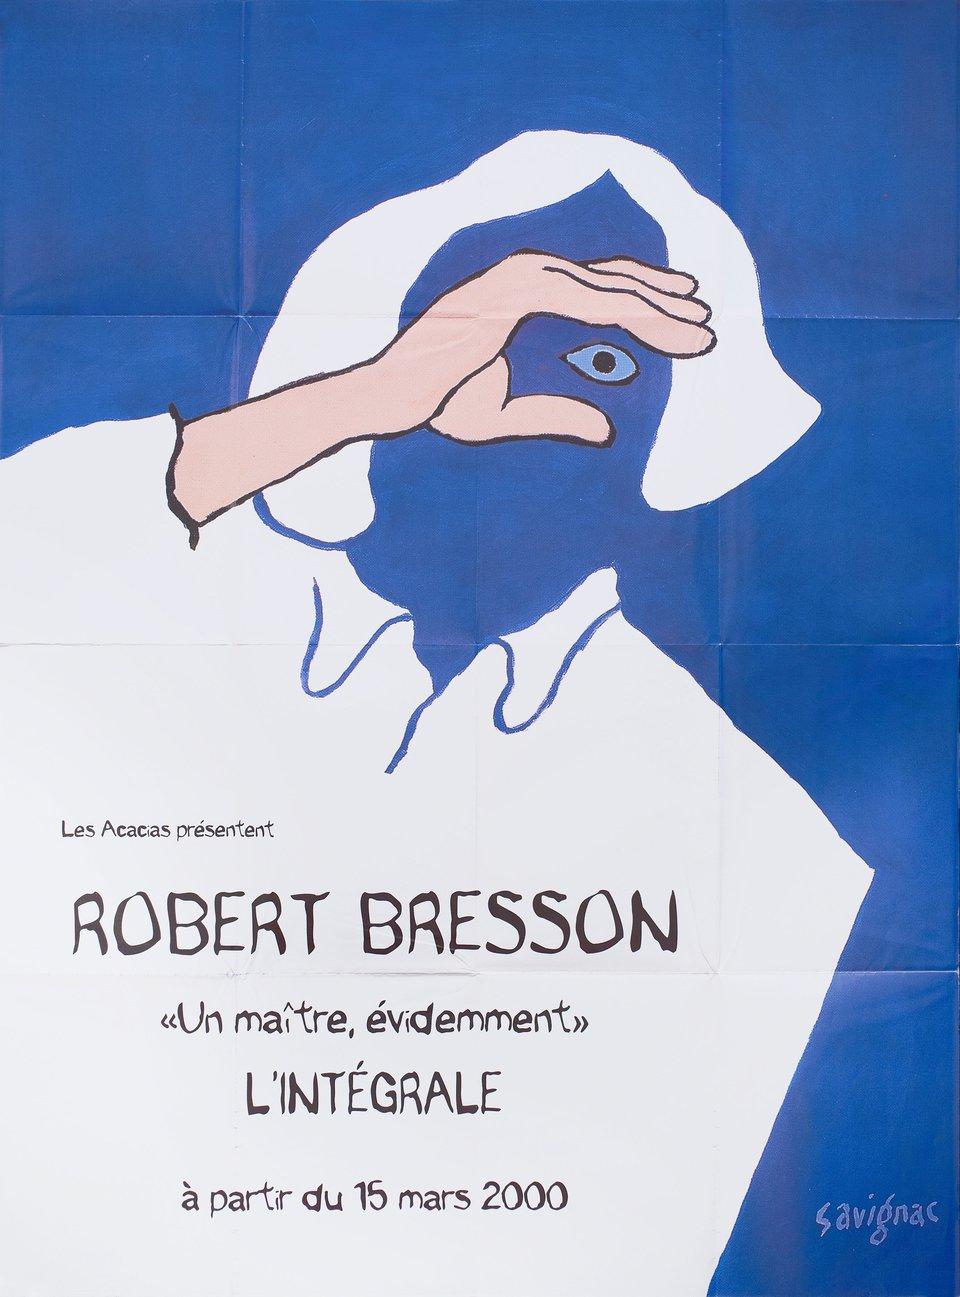 Bresson Festival 2000 French Grande Poster